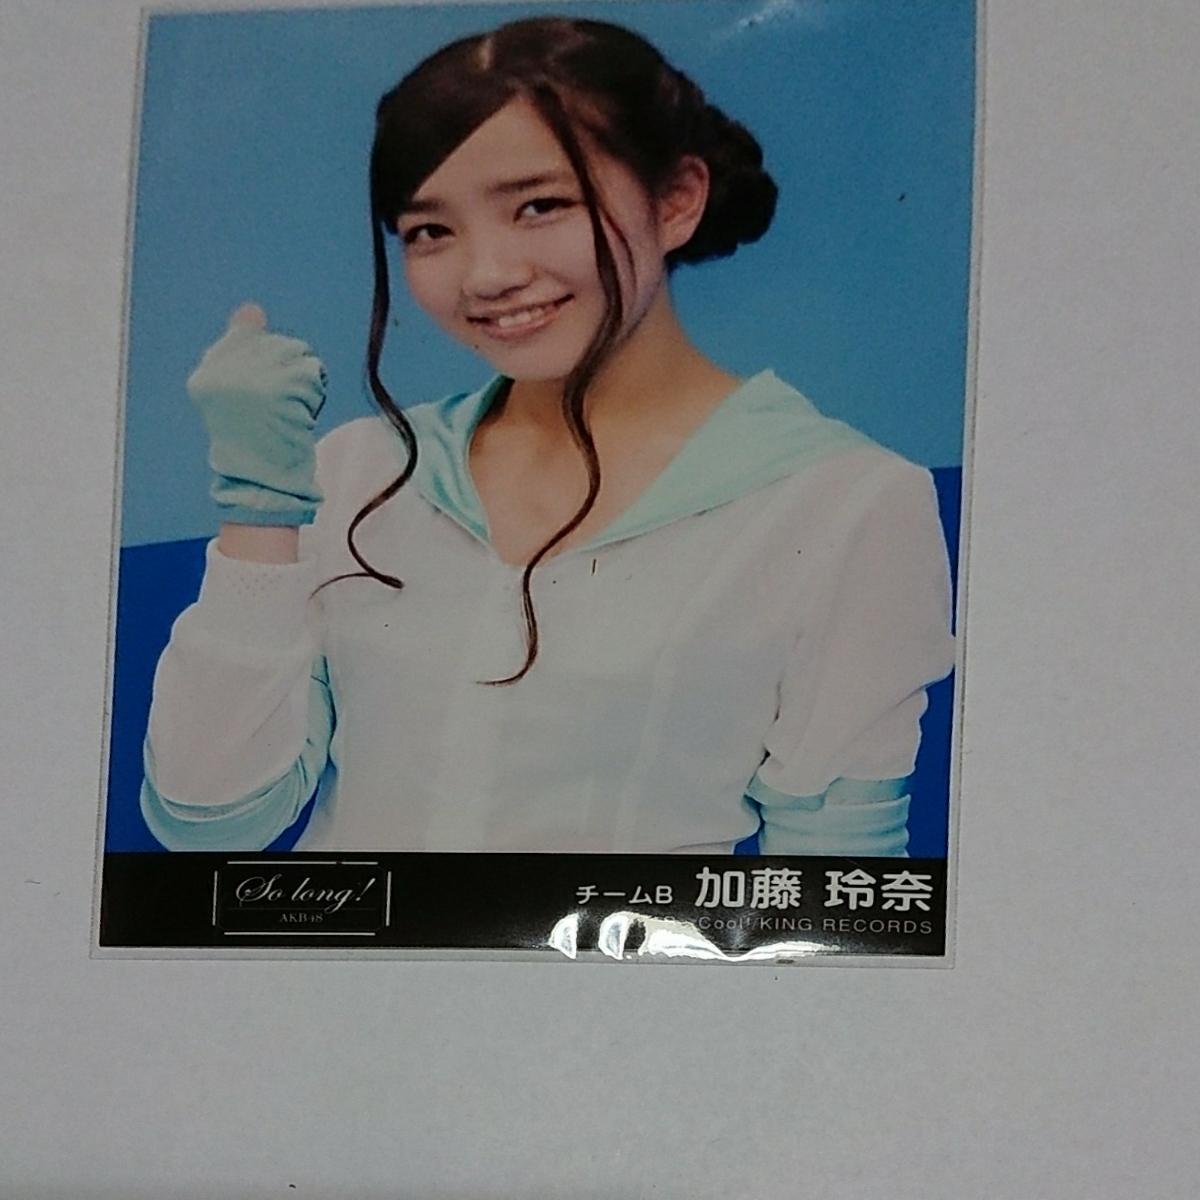 AKBグループ生写真●加藤玲奈コレクション 7/7 So long! チームB